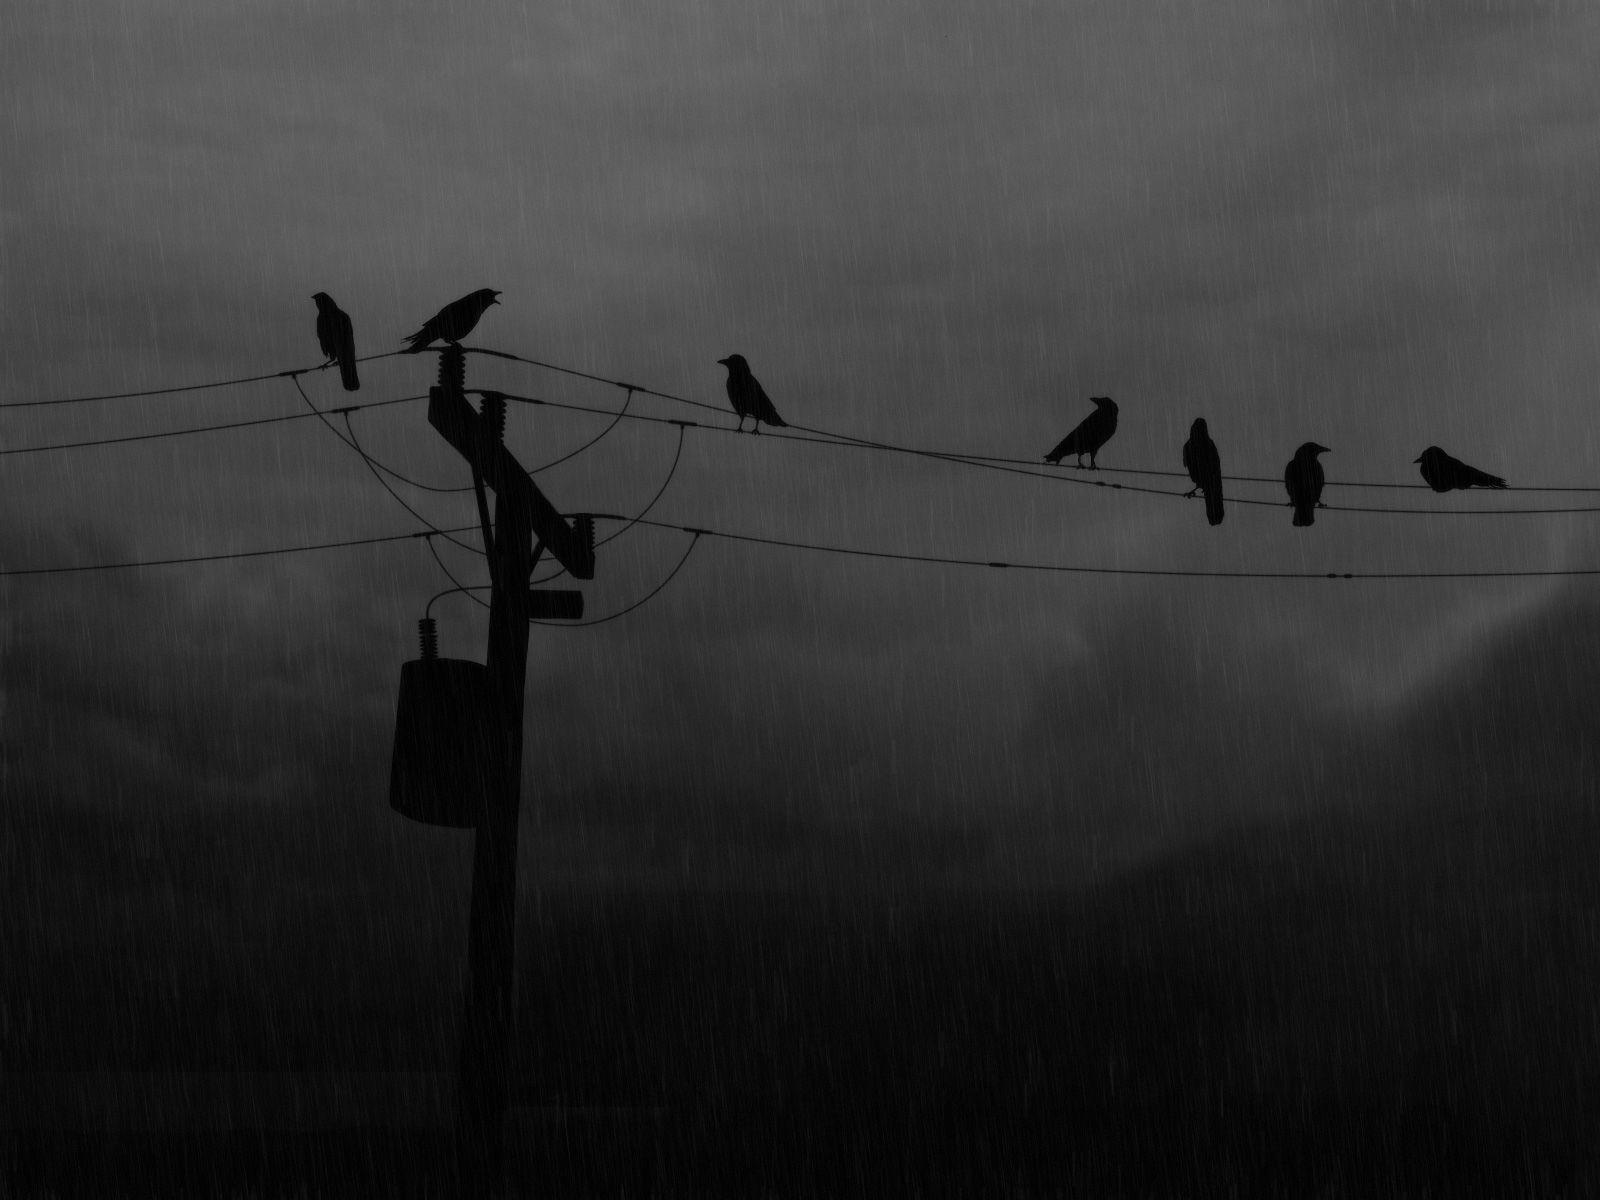 Flying Crow Wallpaper